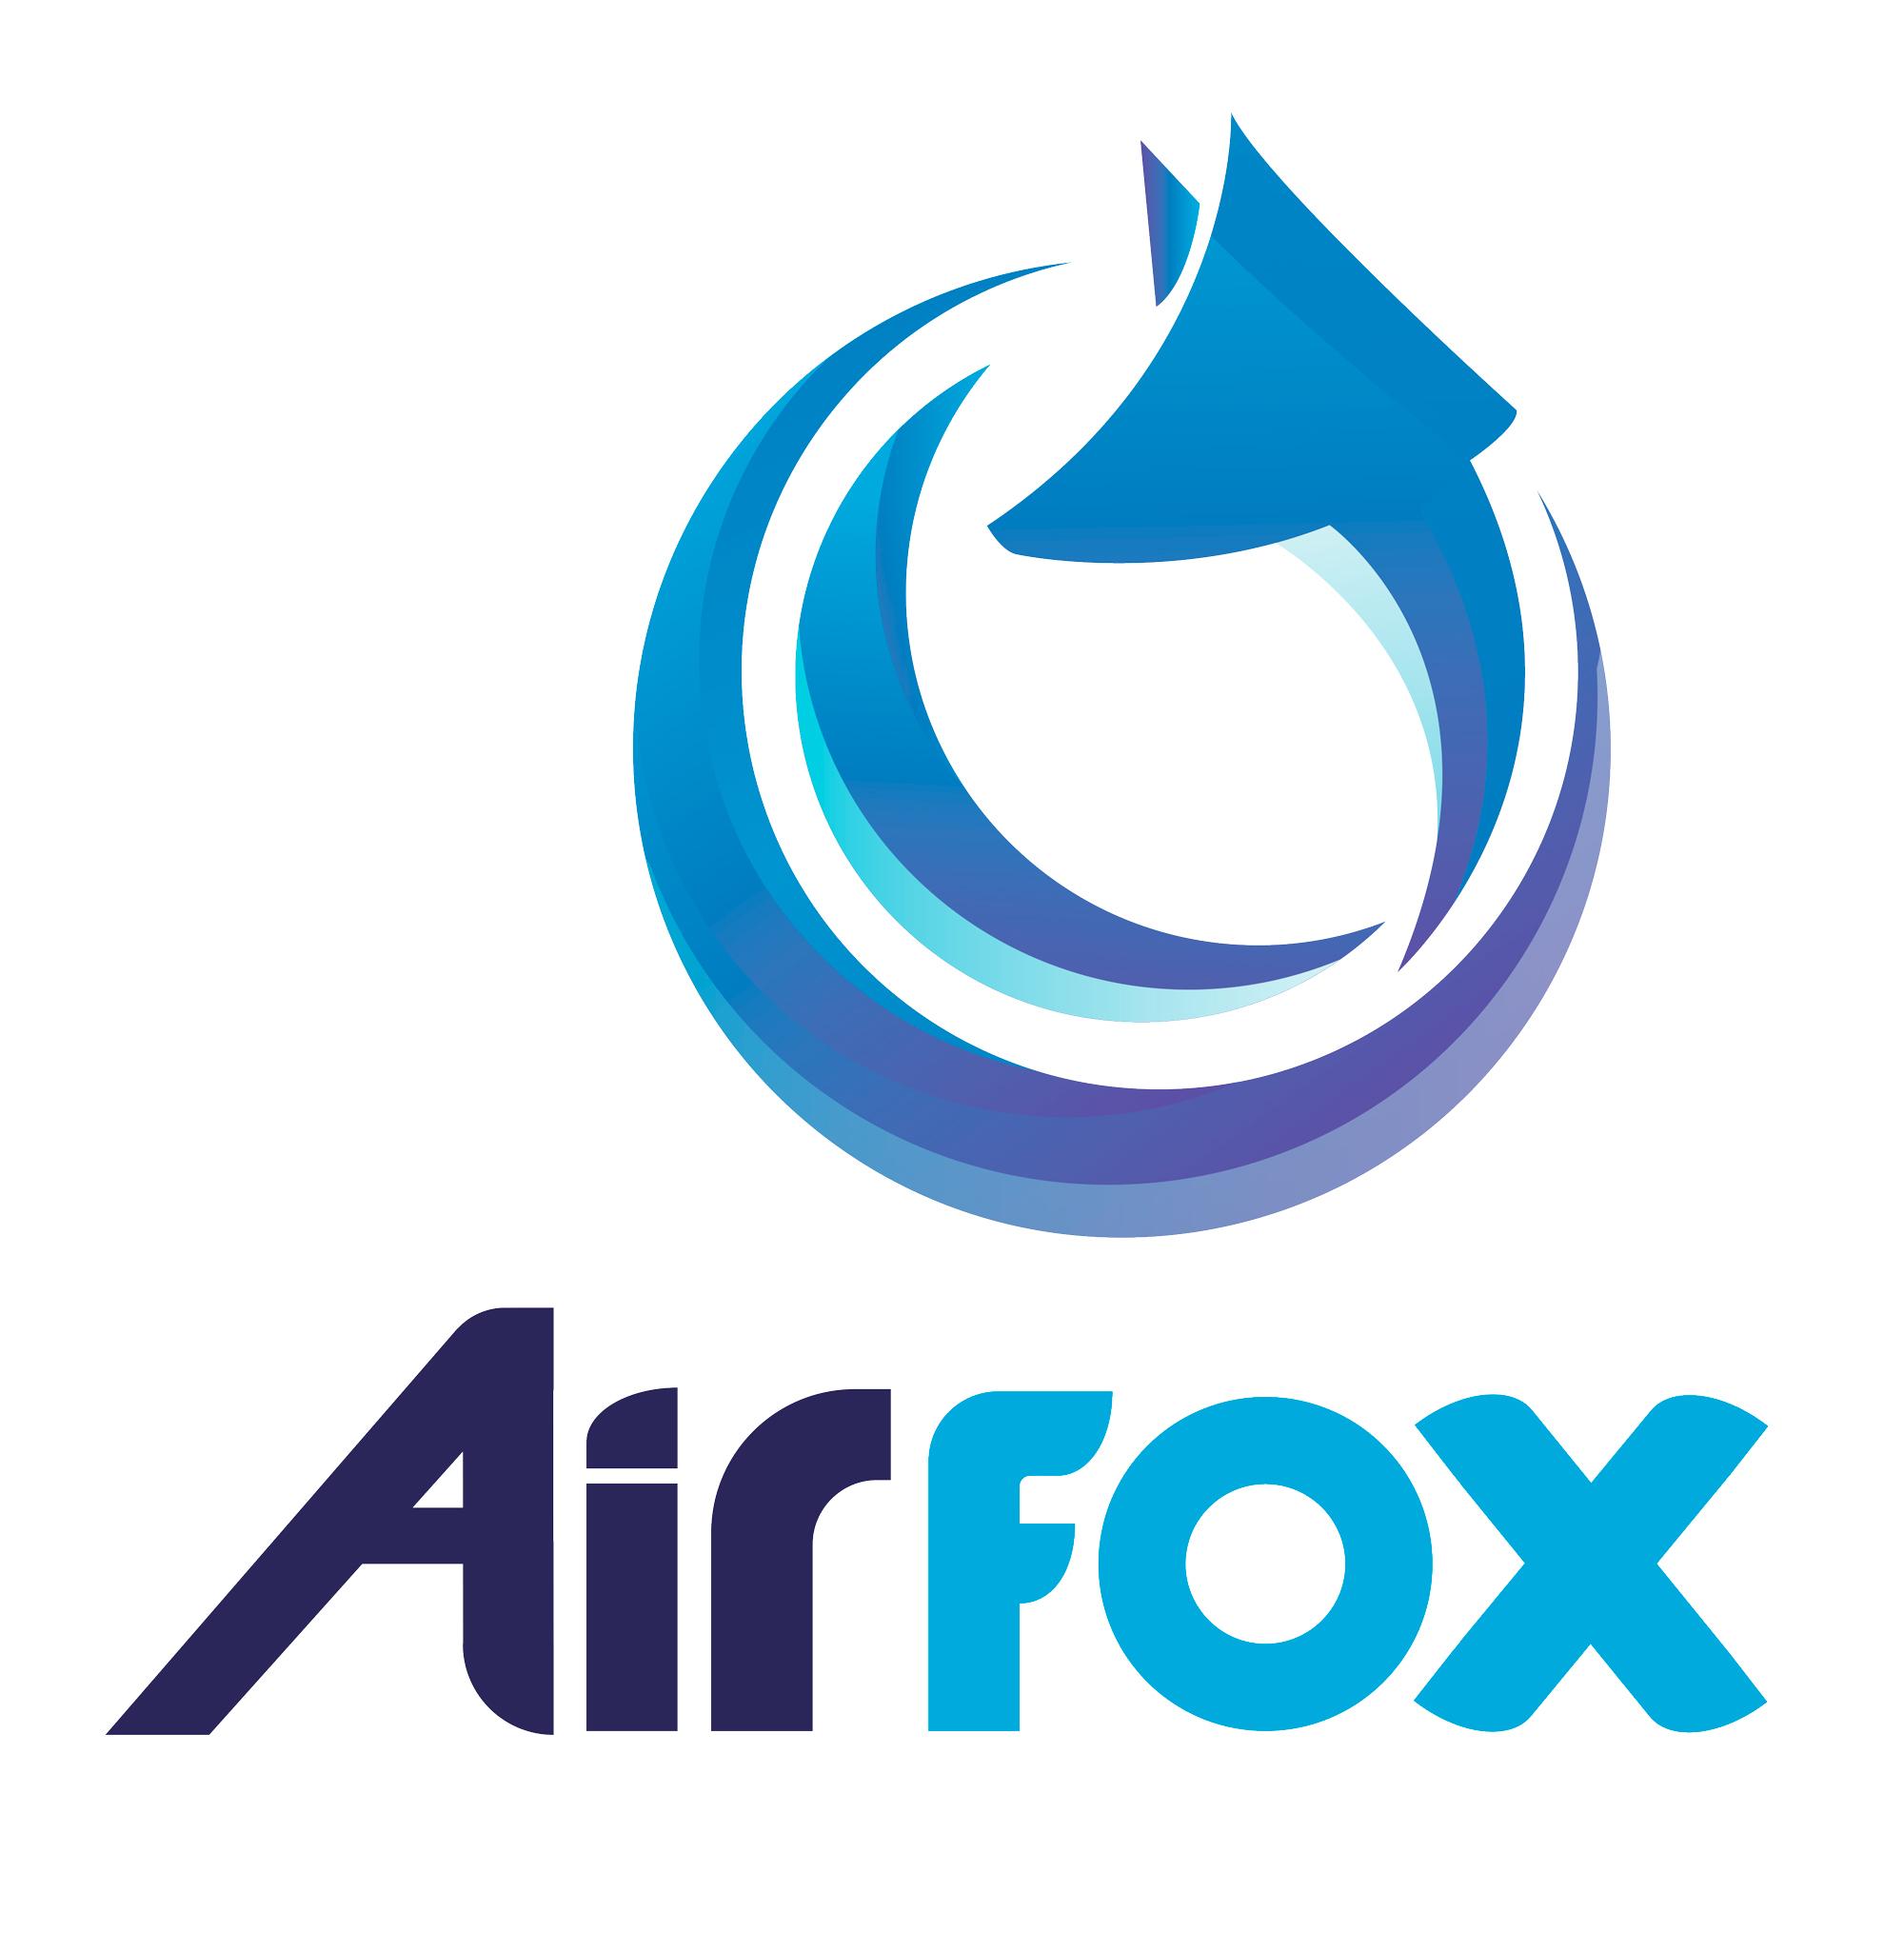 AirFox Closes $6.5 Million AirToken Pre-Sale Weeks Ahead of Schedule